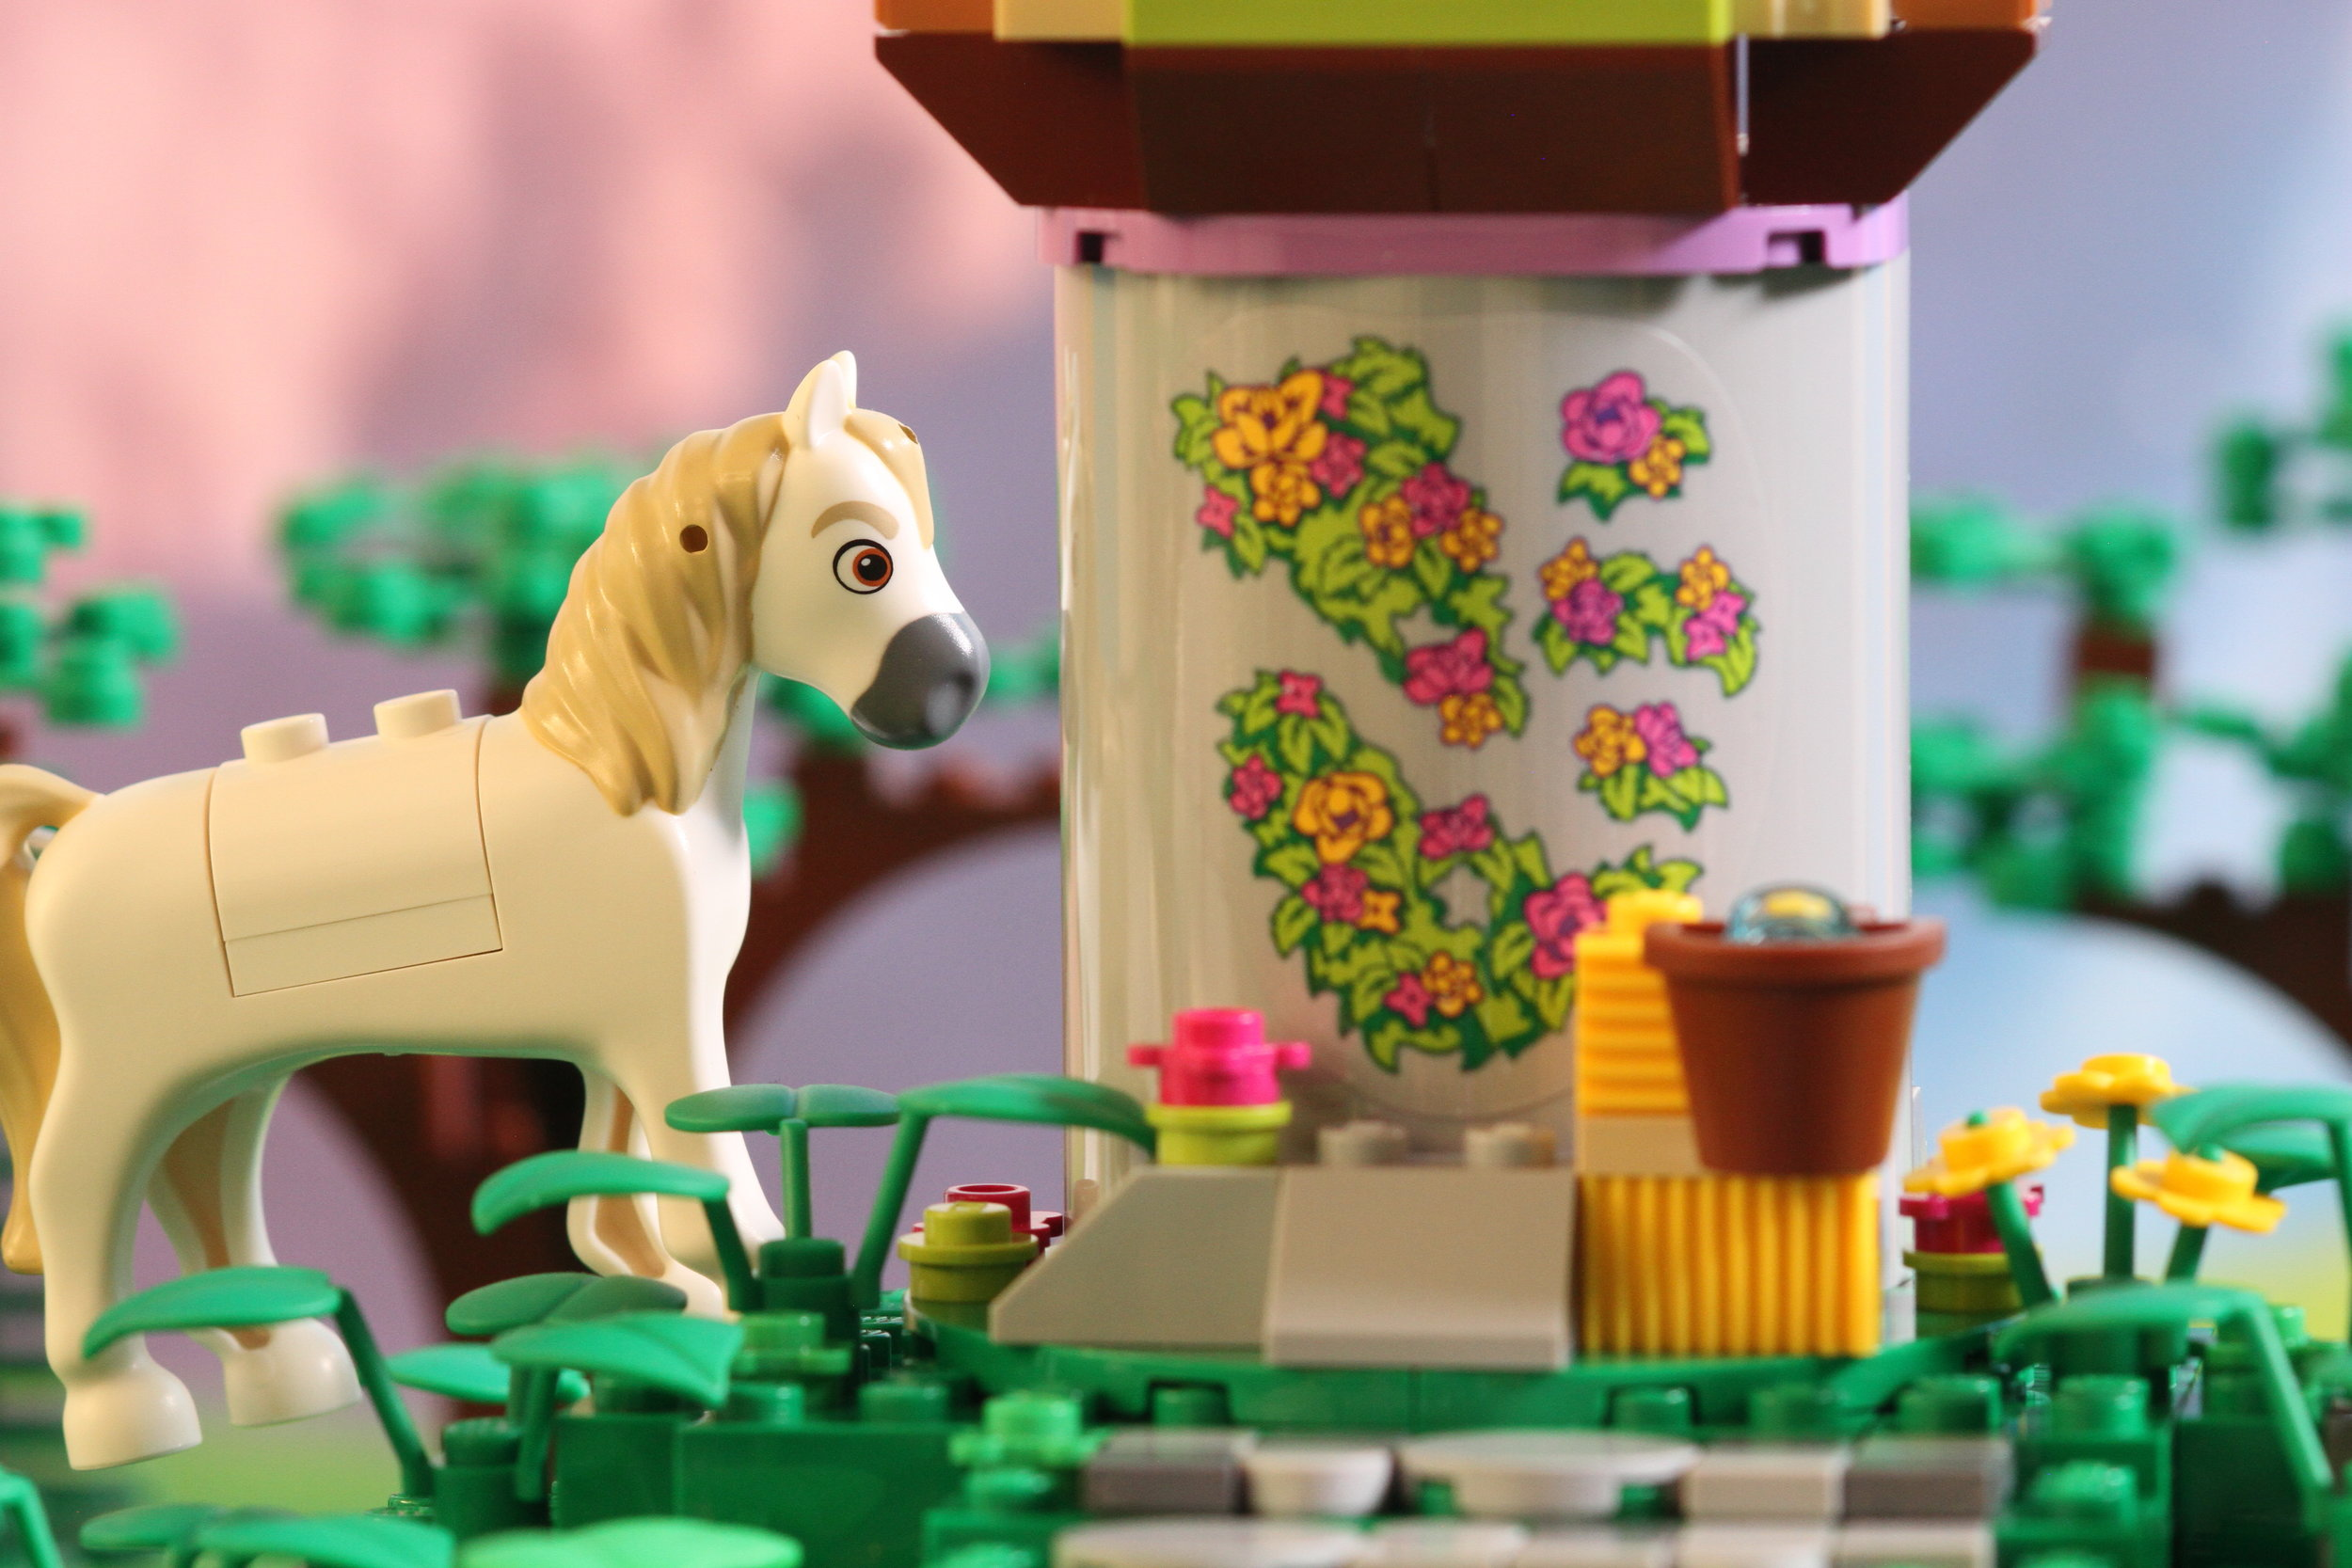 Princess_Rapunzel_sc030_X1_0013.jpg